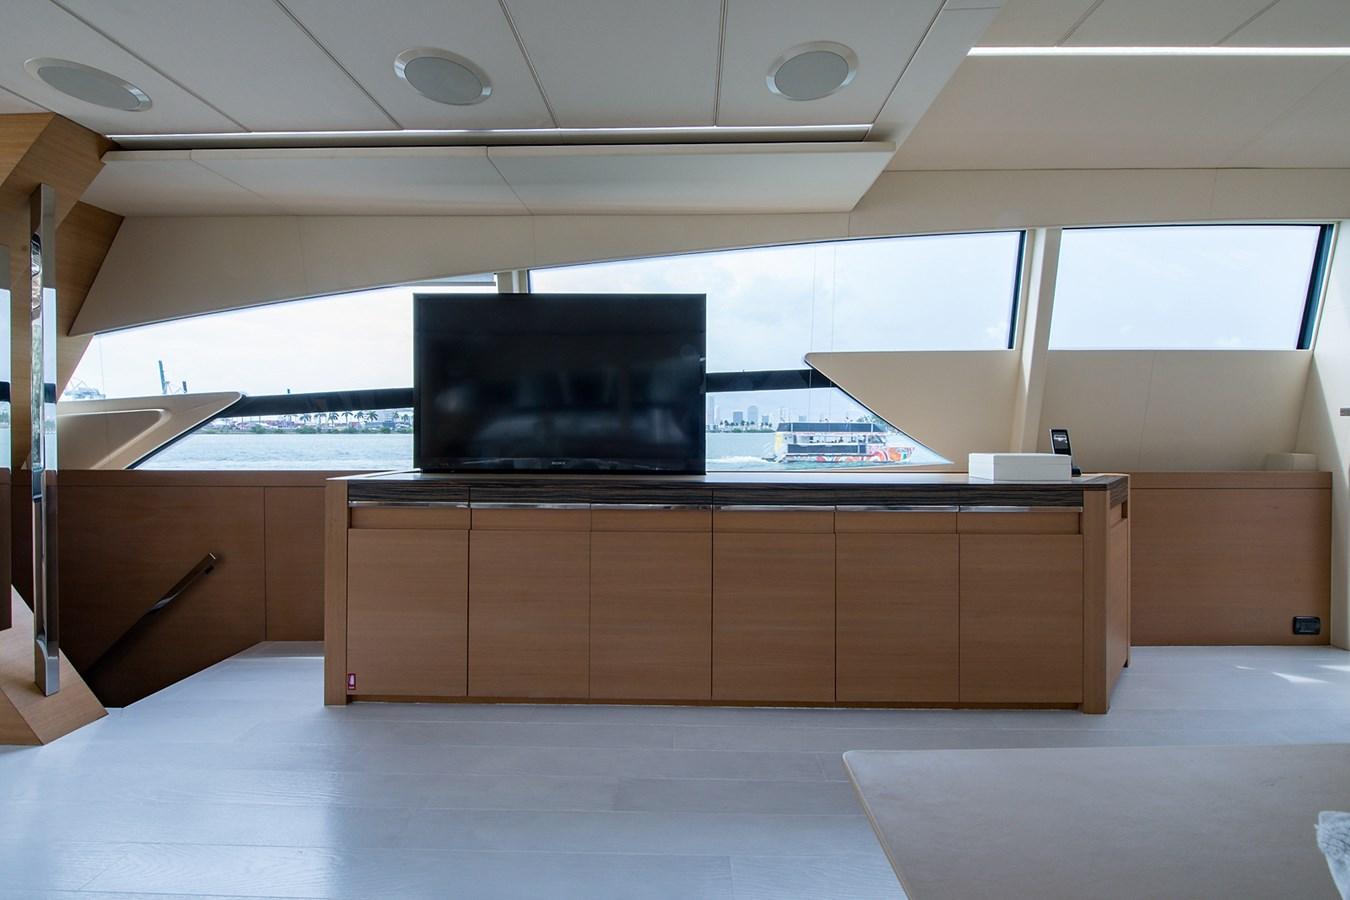 Incognito_Salon10 2012 PERSHING  Motor Yacht 2810384